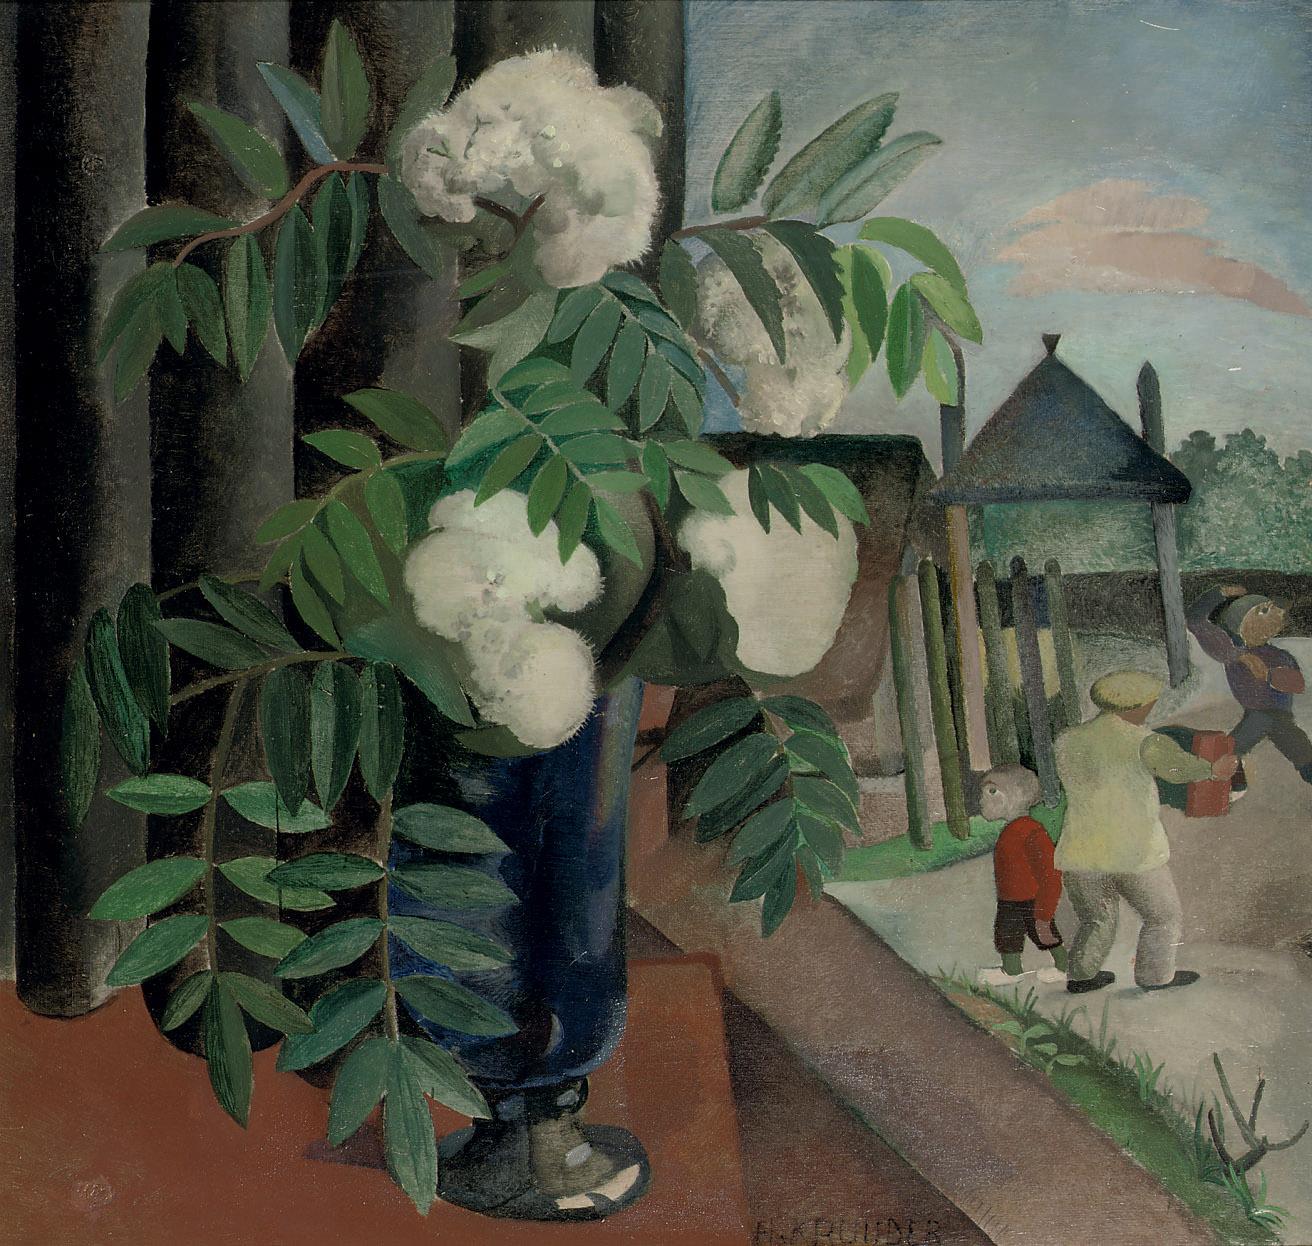 Herman Kruyder (1881-1935)